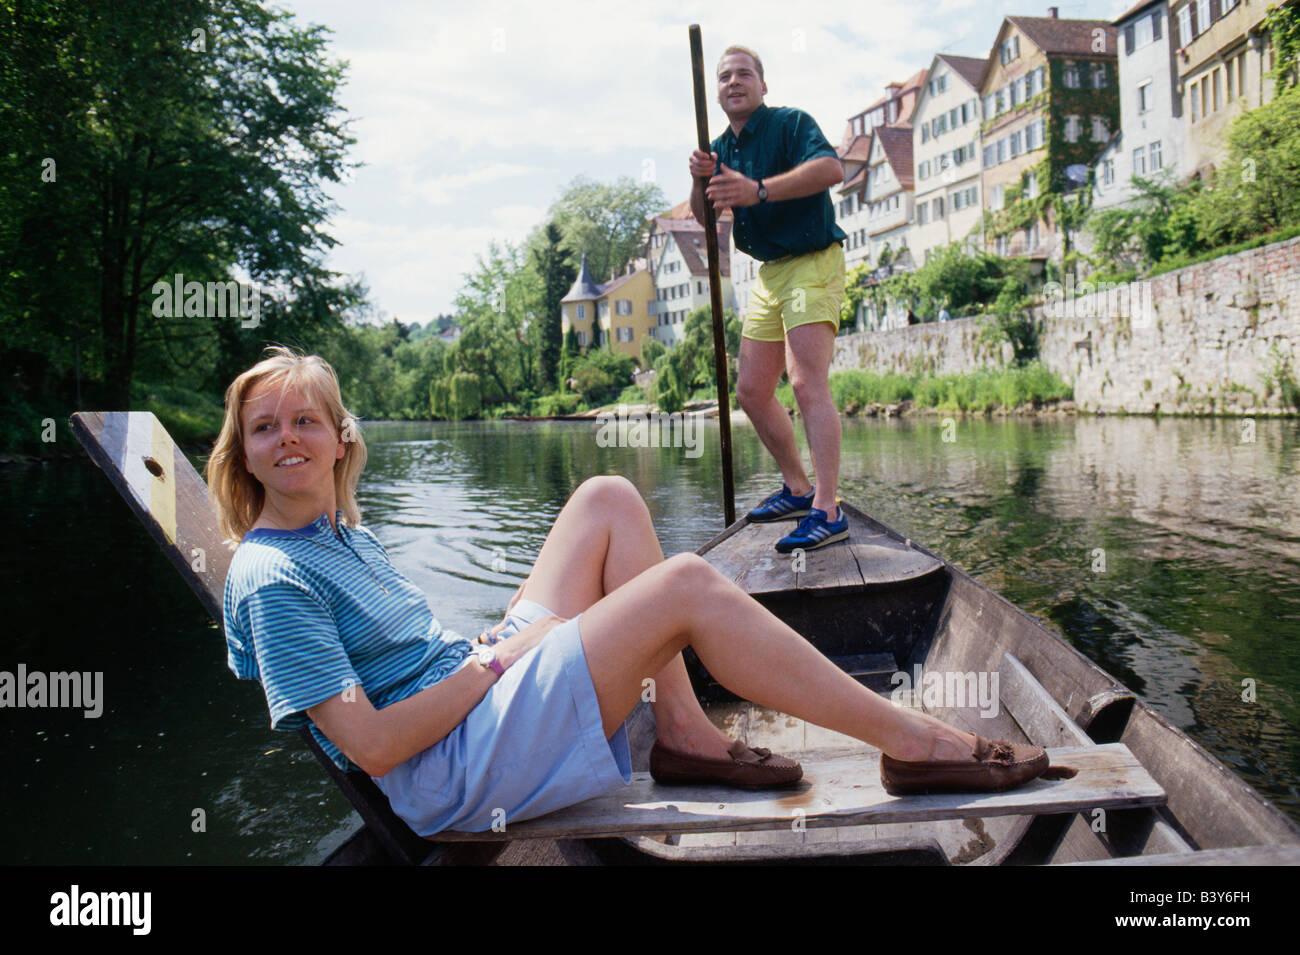 University students Punting (boating) on the Neckar river, TŸBINGEN, Germany - Stock Image